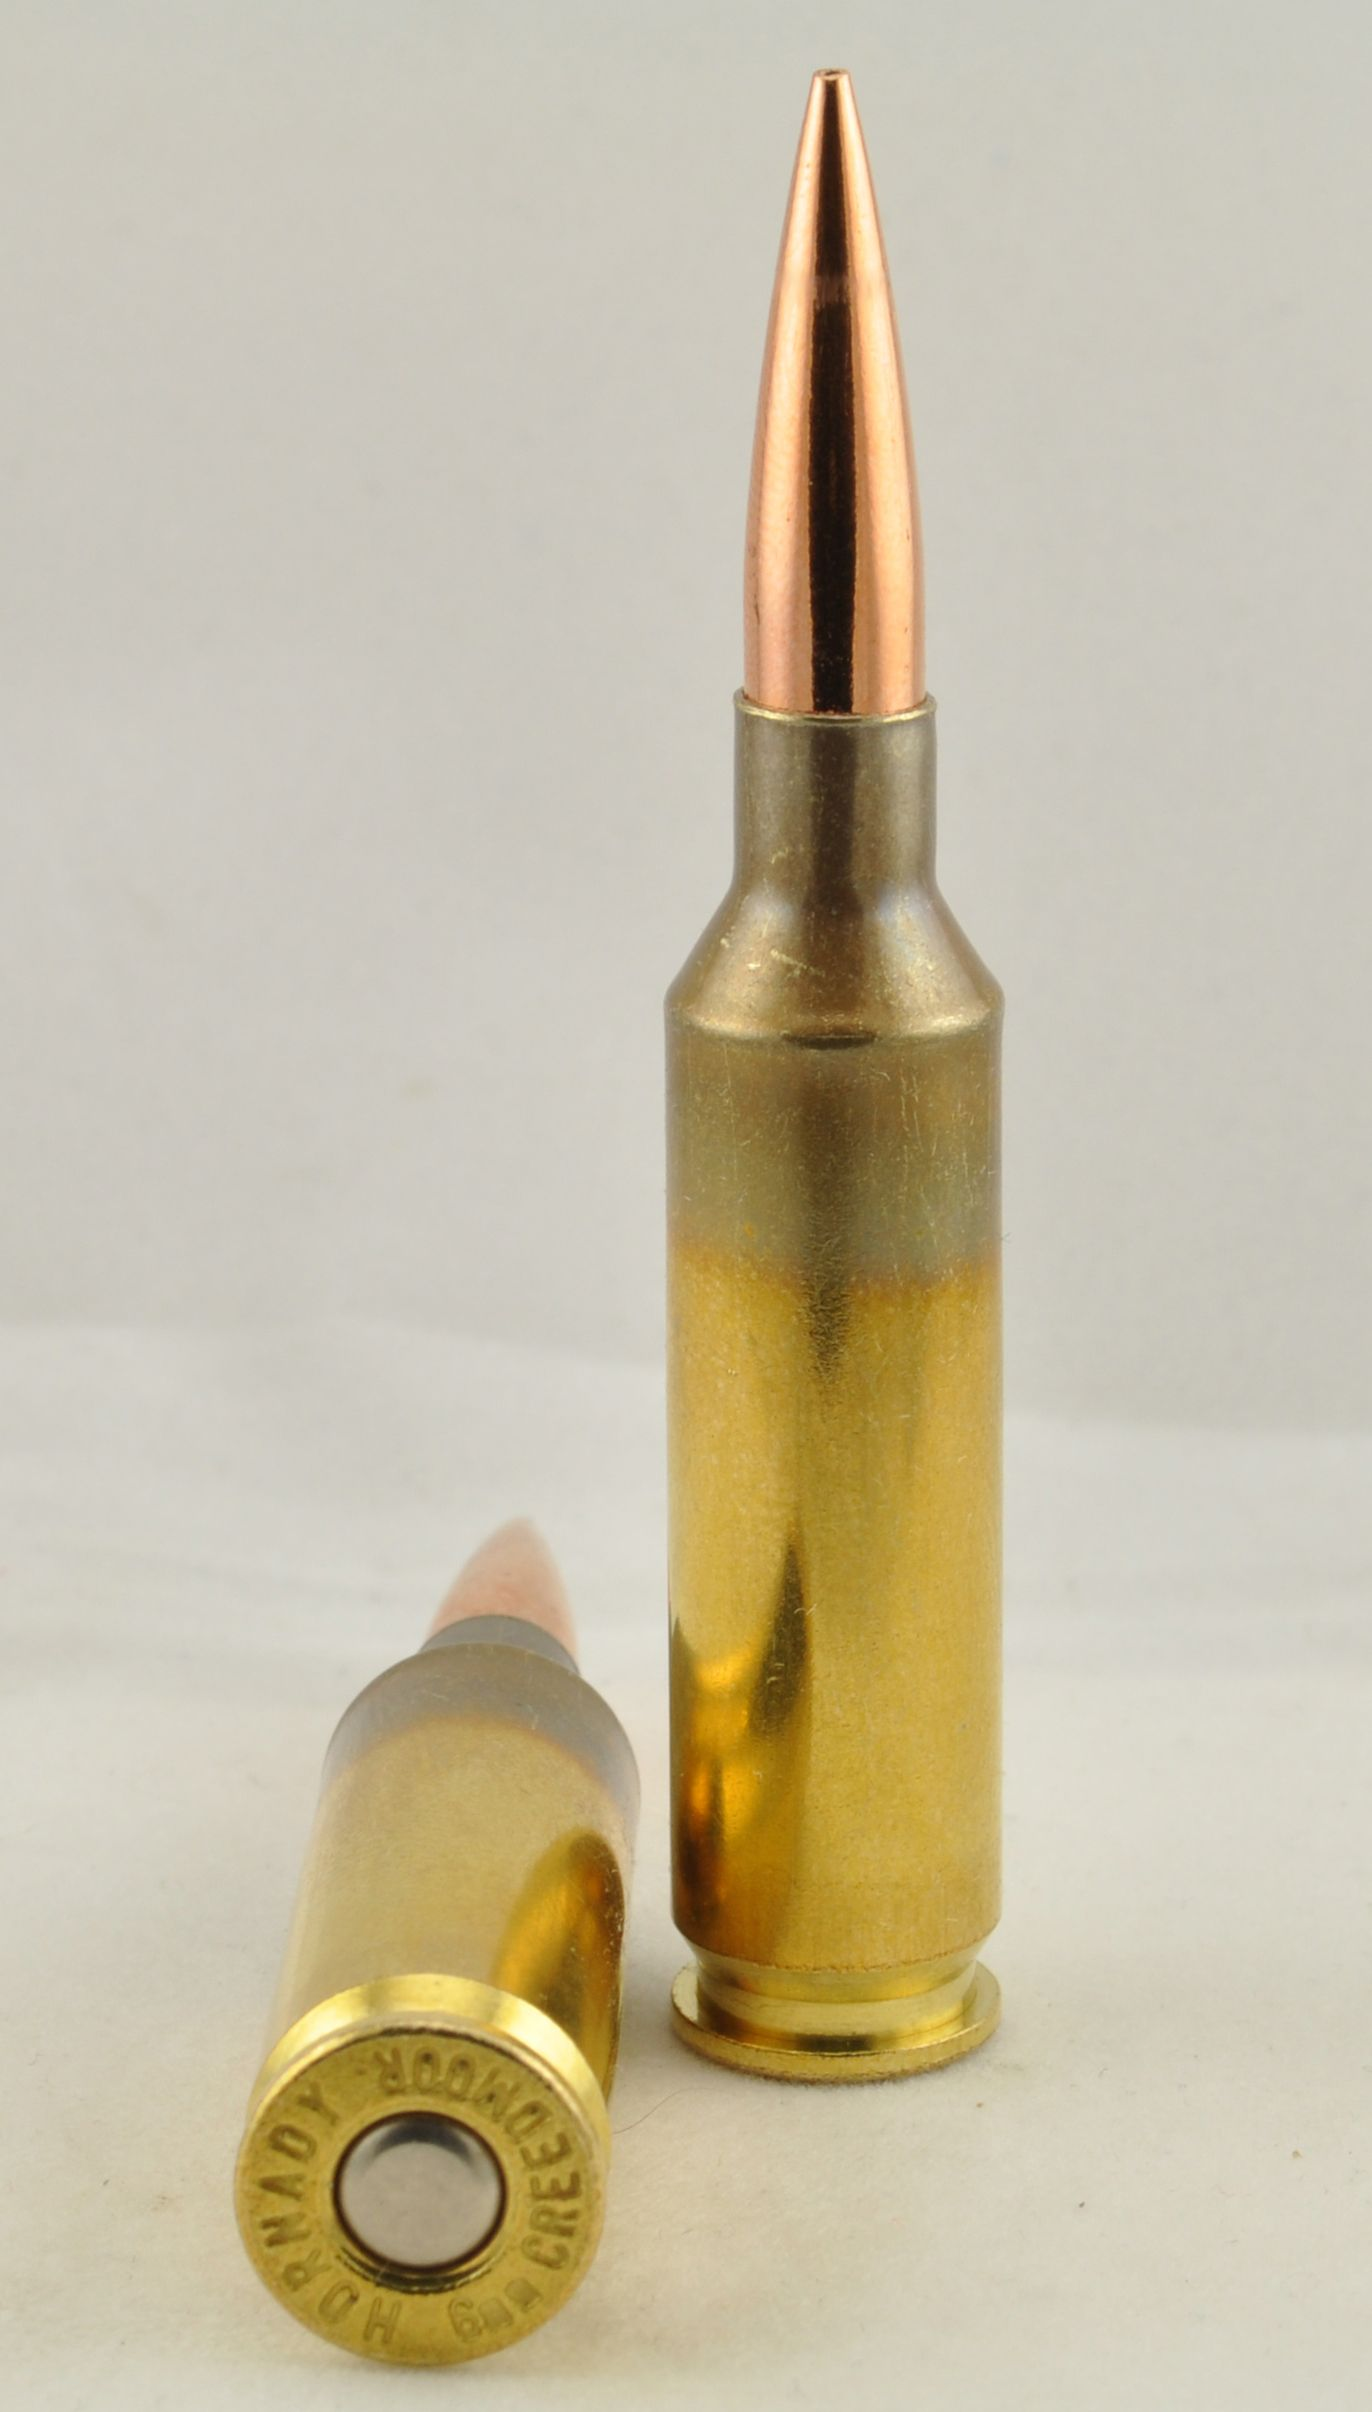 6mm Creedmoor 105 Berger Hybrid | PRS rifle | Reloading ammo